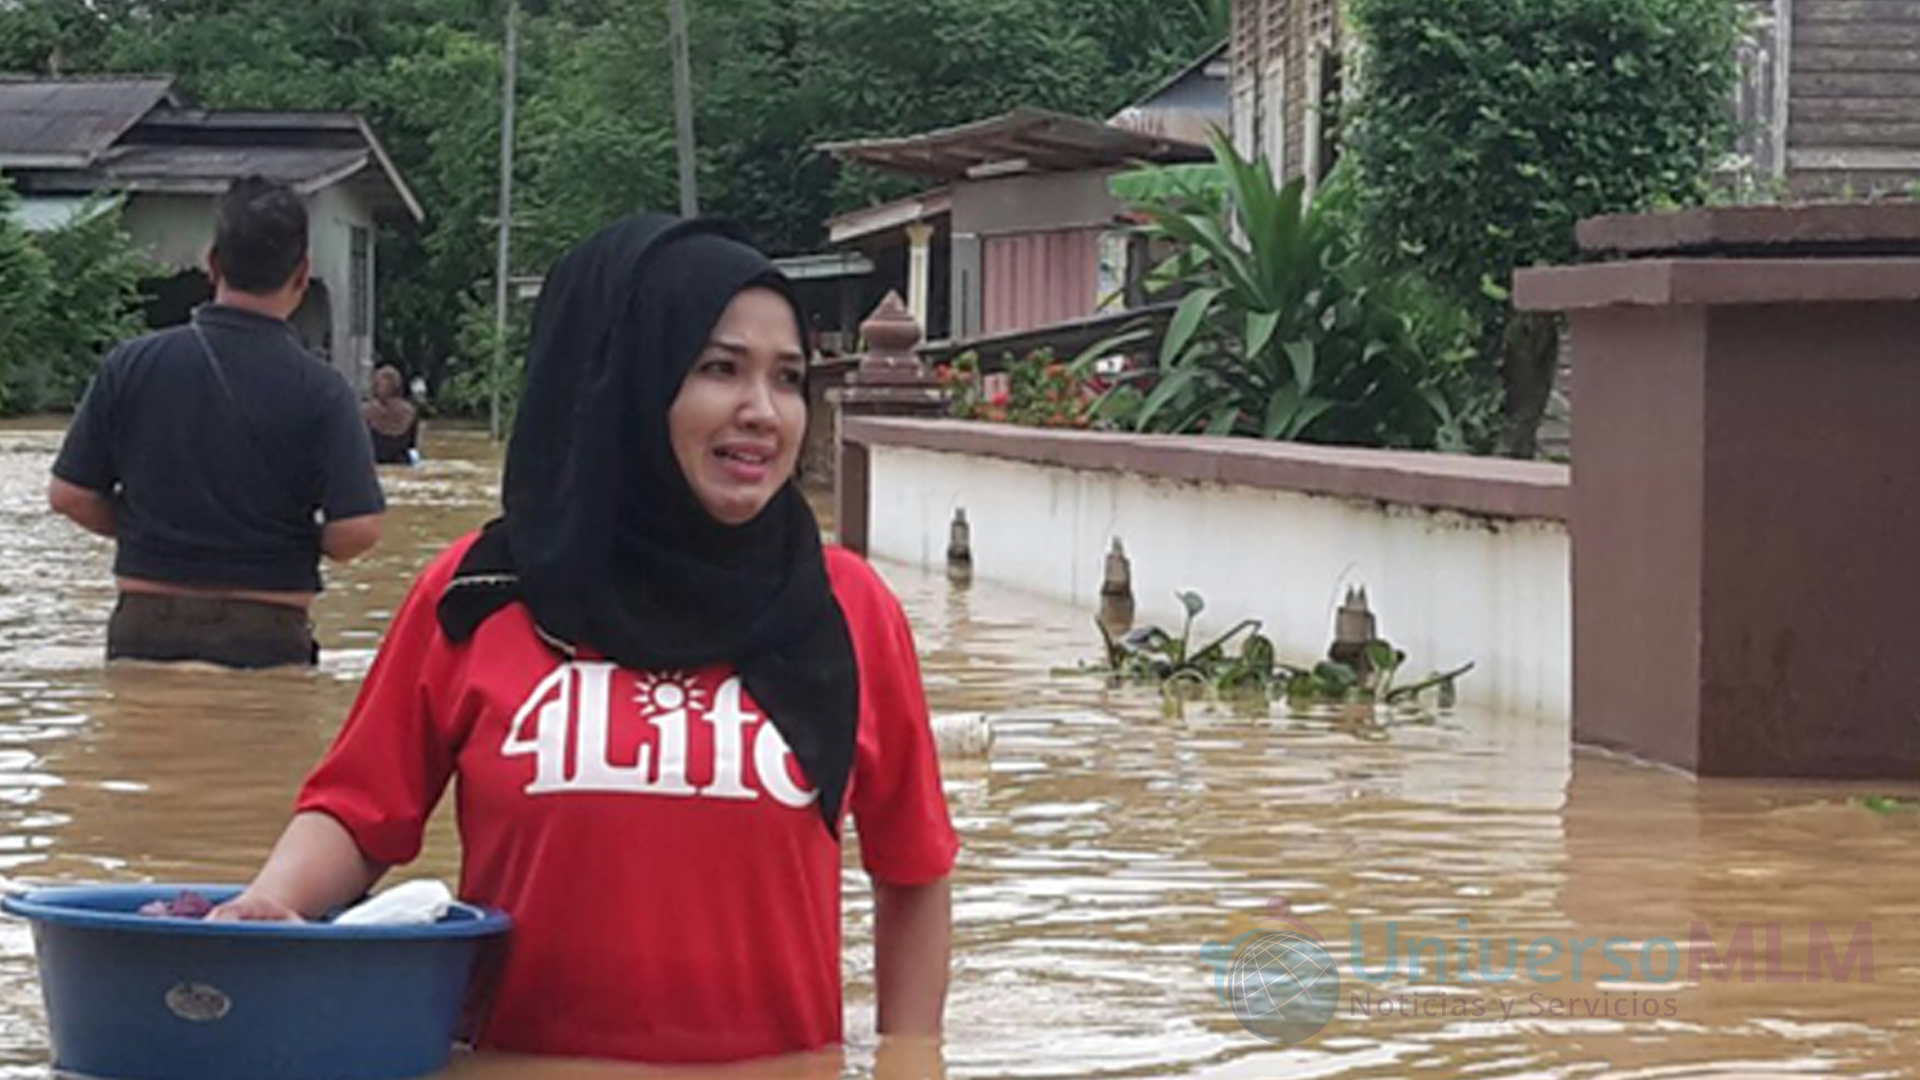 4life-malasia.jpg